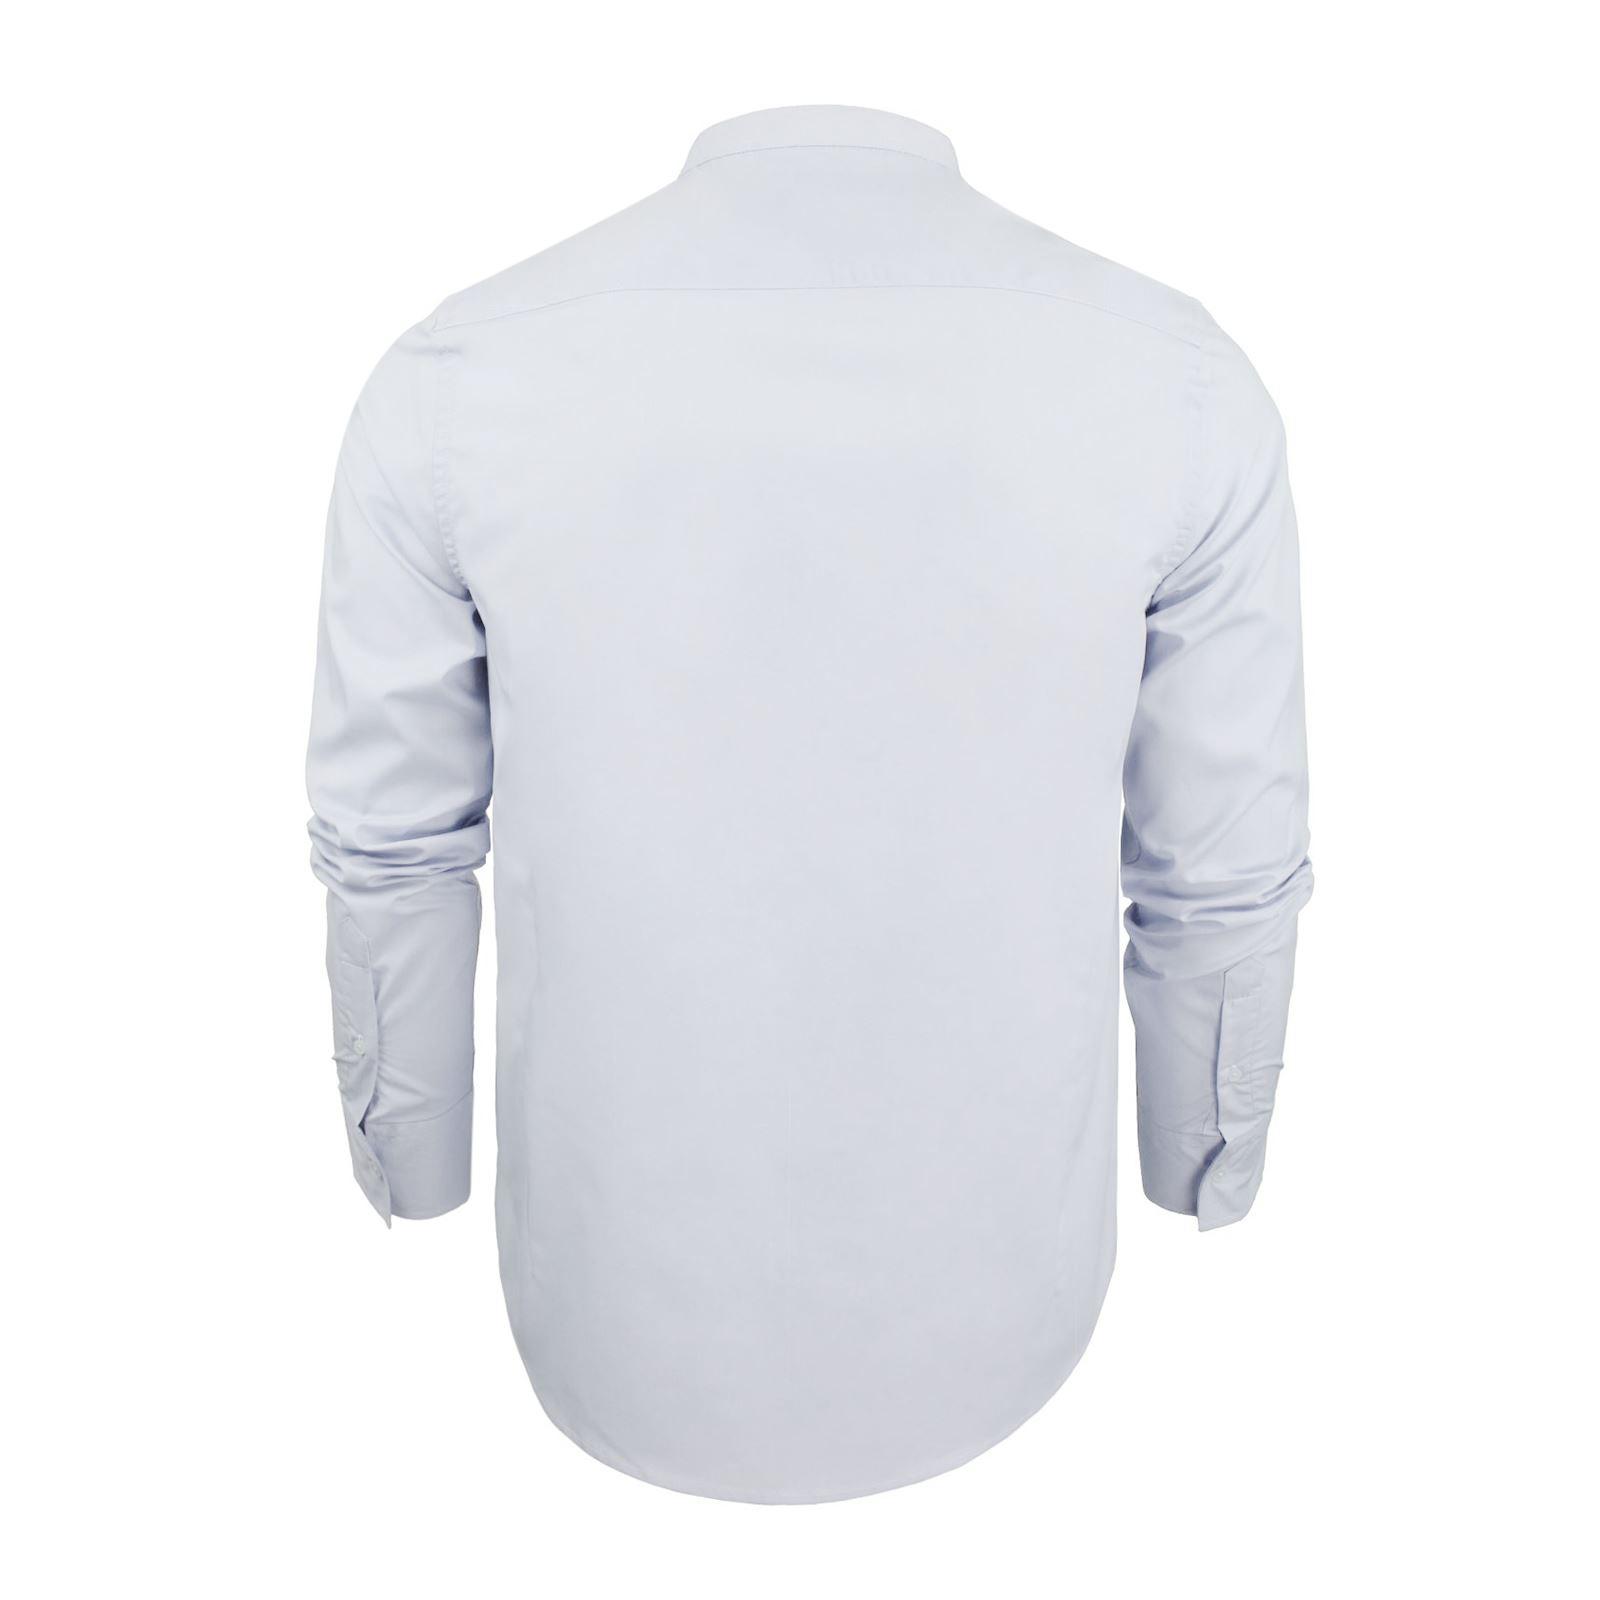 Mens-Shirt-Brave-Soul-Magnus-Plain-Grandad-Collar-Long-Sleeve-Casual-Top thumbnail 3